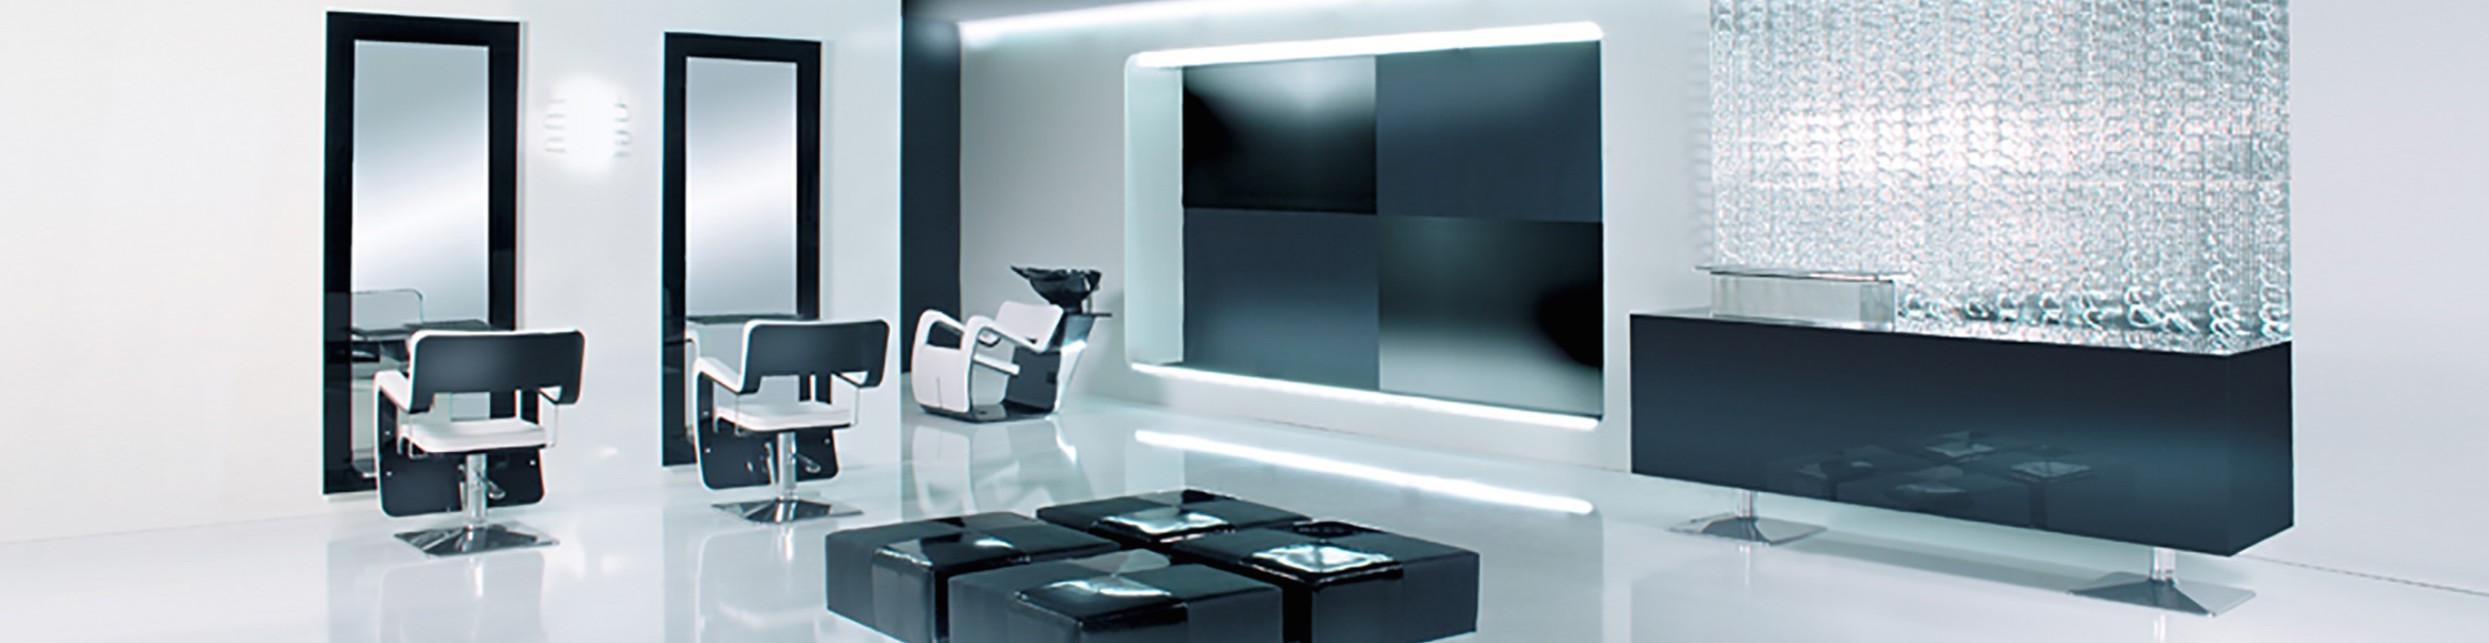 Salon inrichting Wicoli Cosmetics